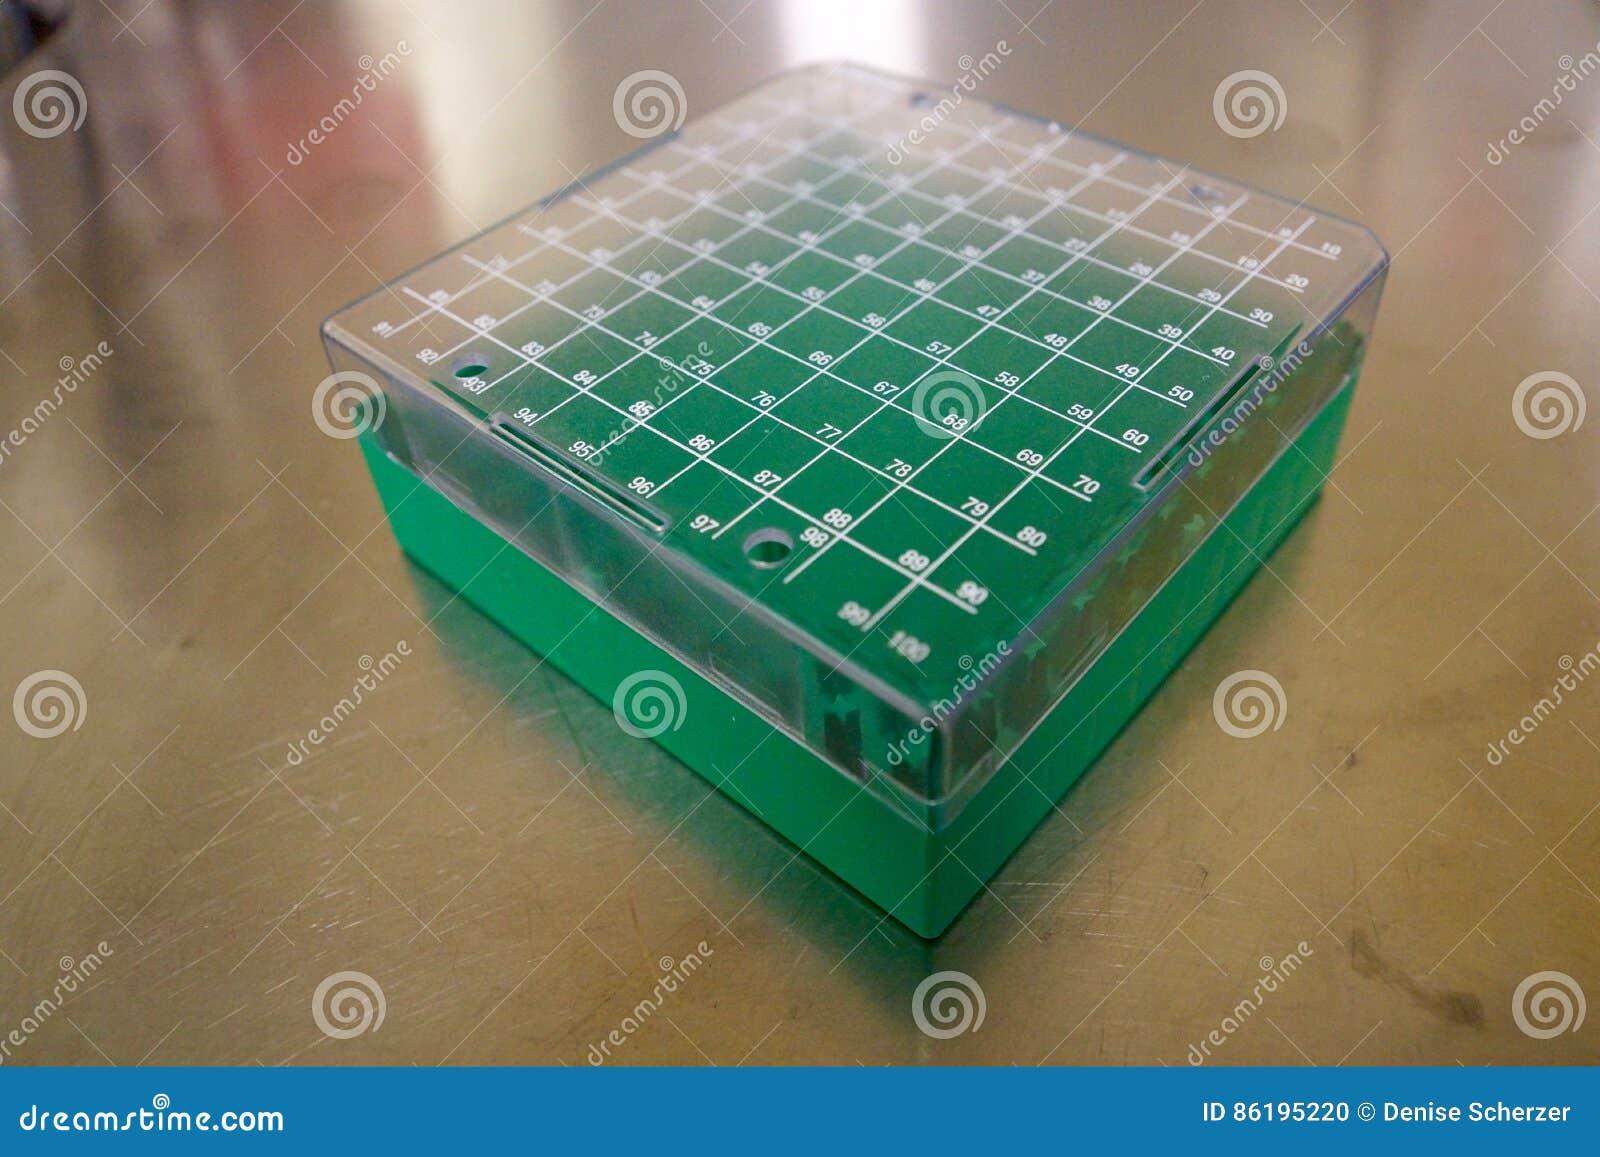 Laboratory Sample Box Stock Photo - Image: 86195220